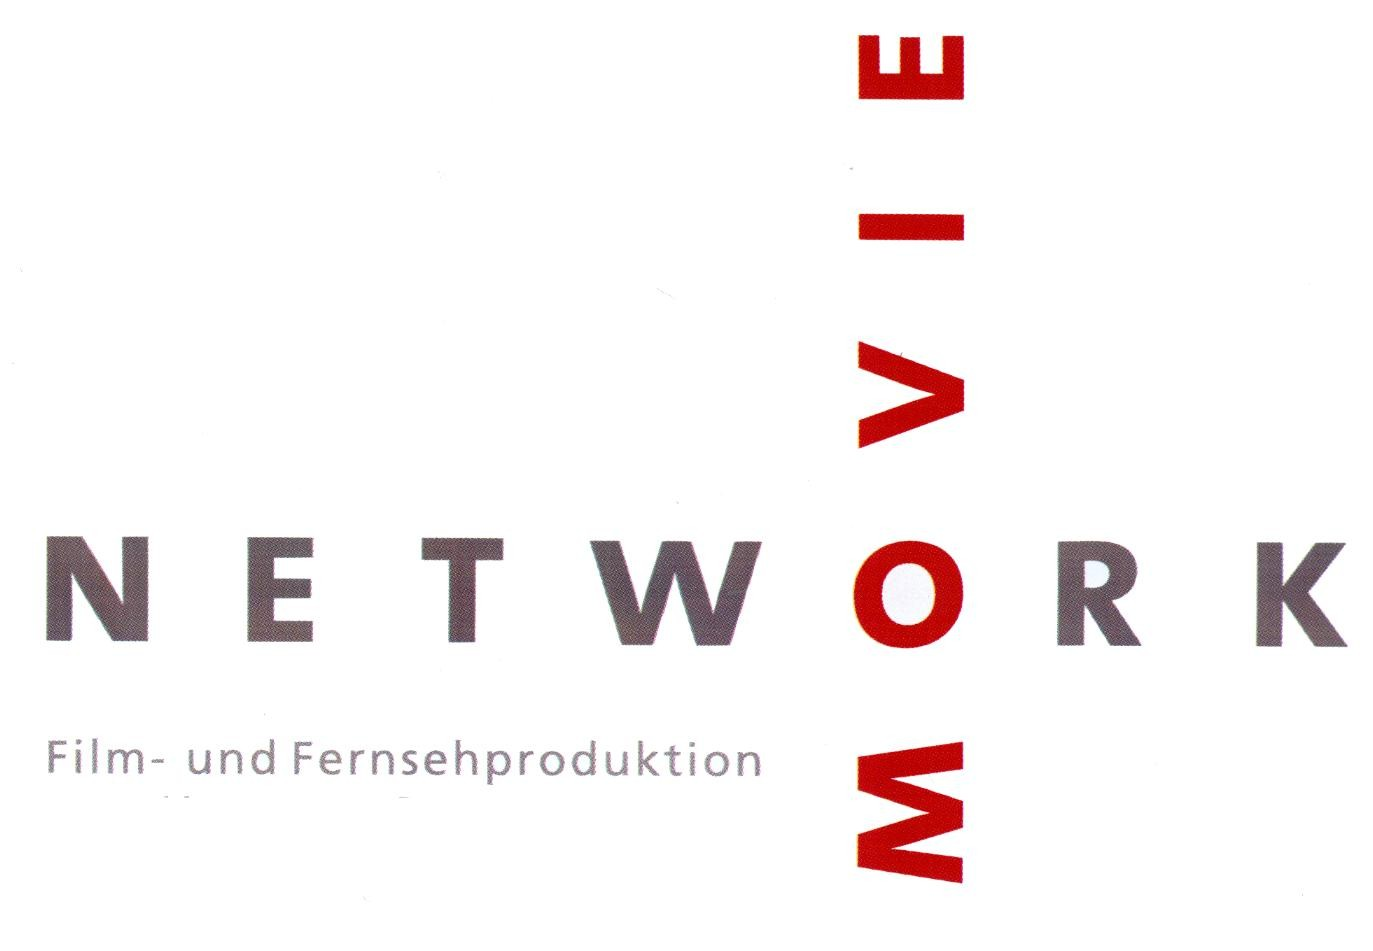 network movie.jpg